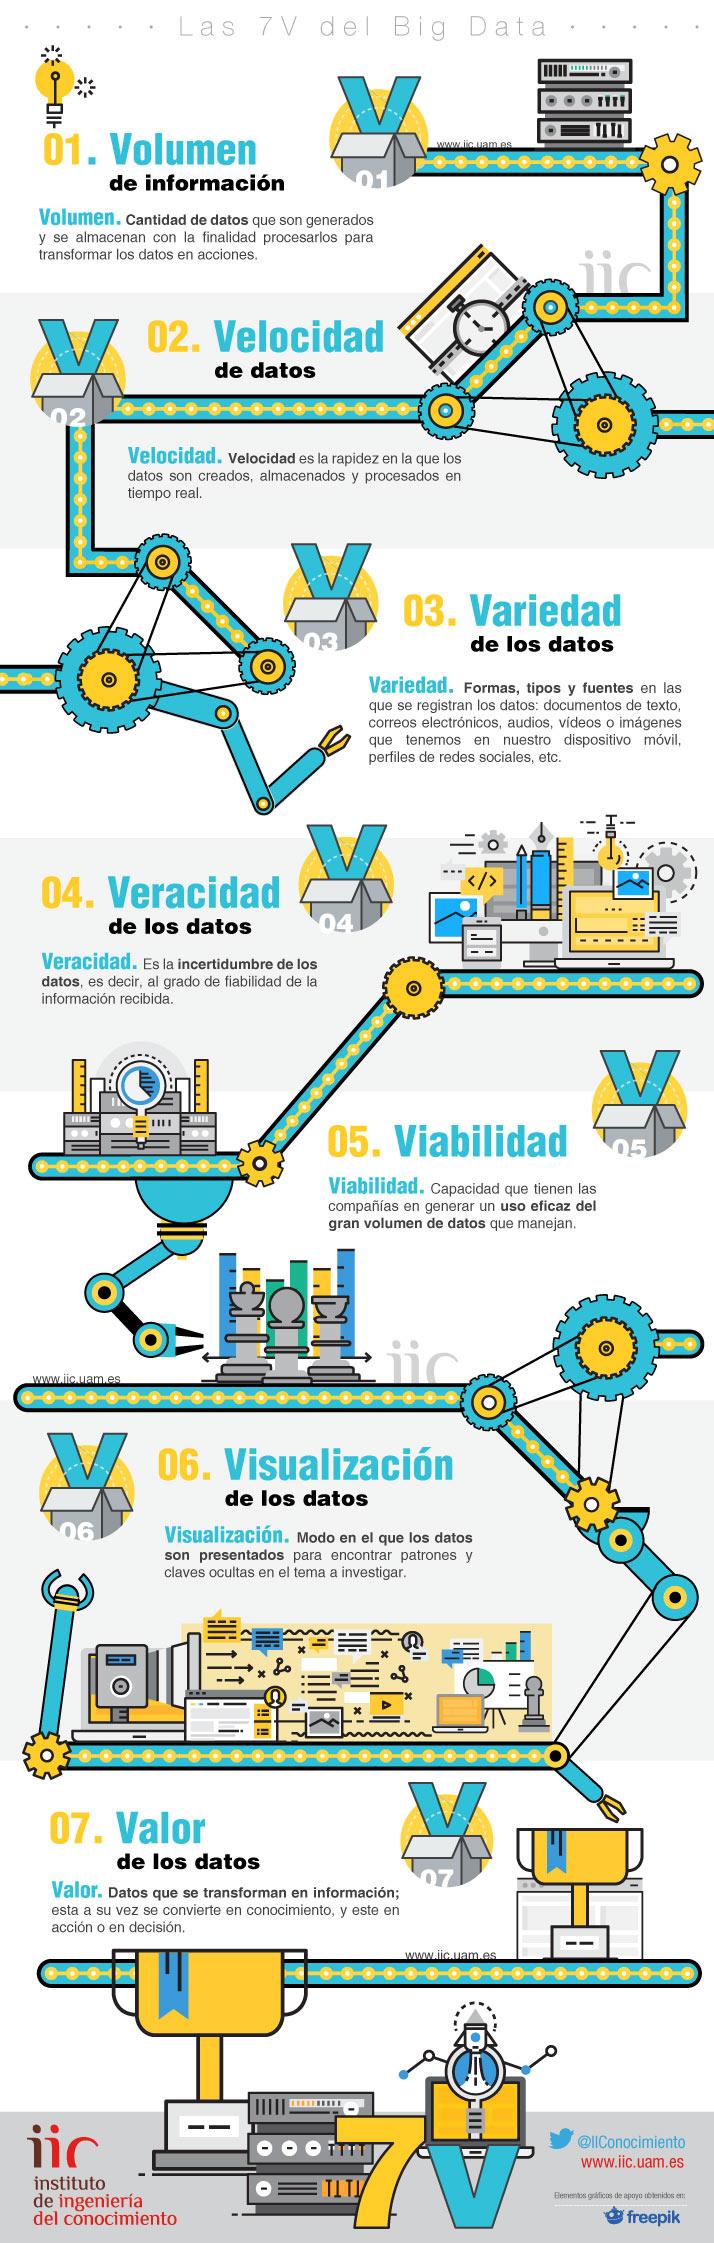 Big Data: las 7V